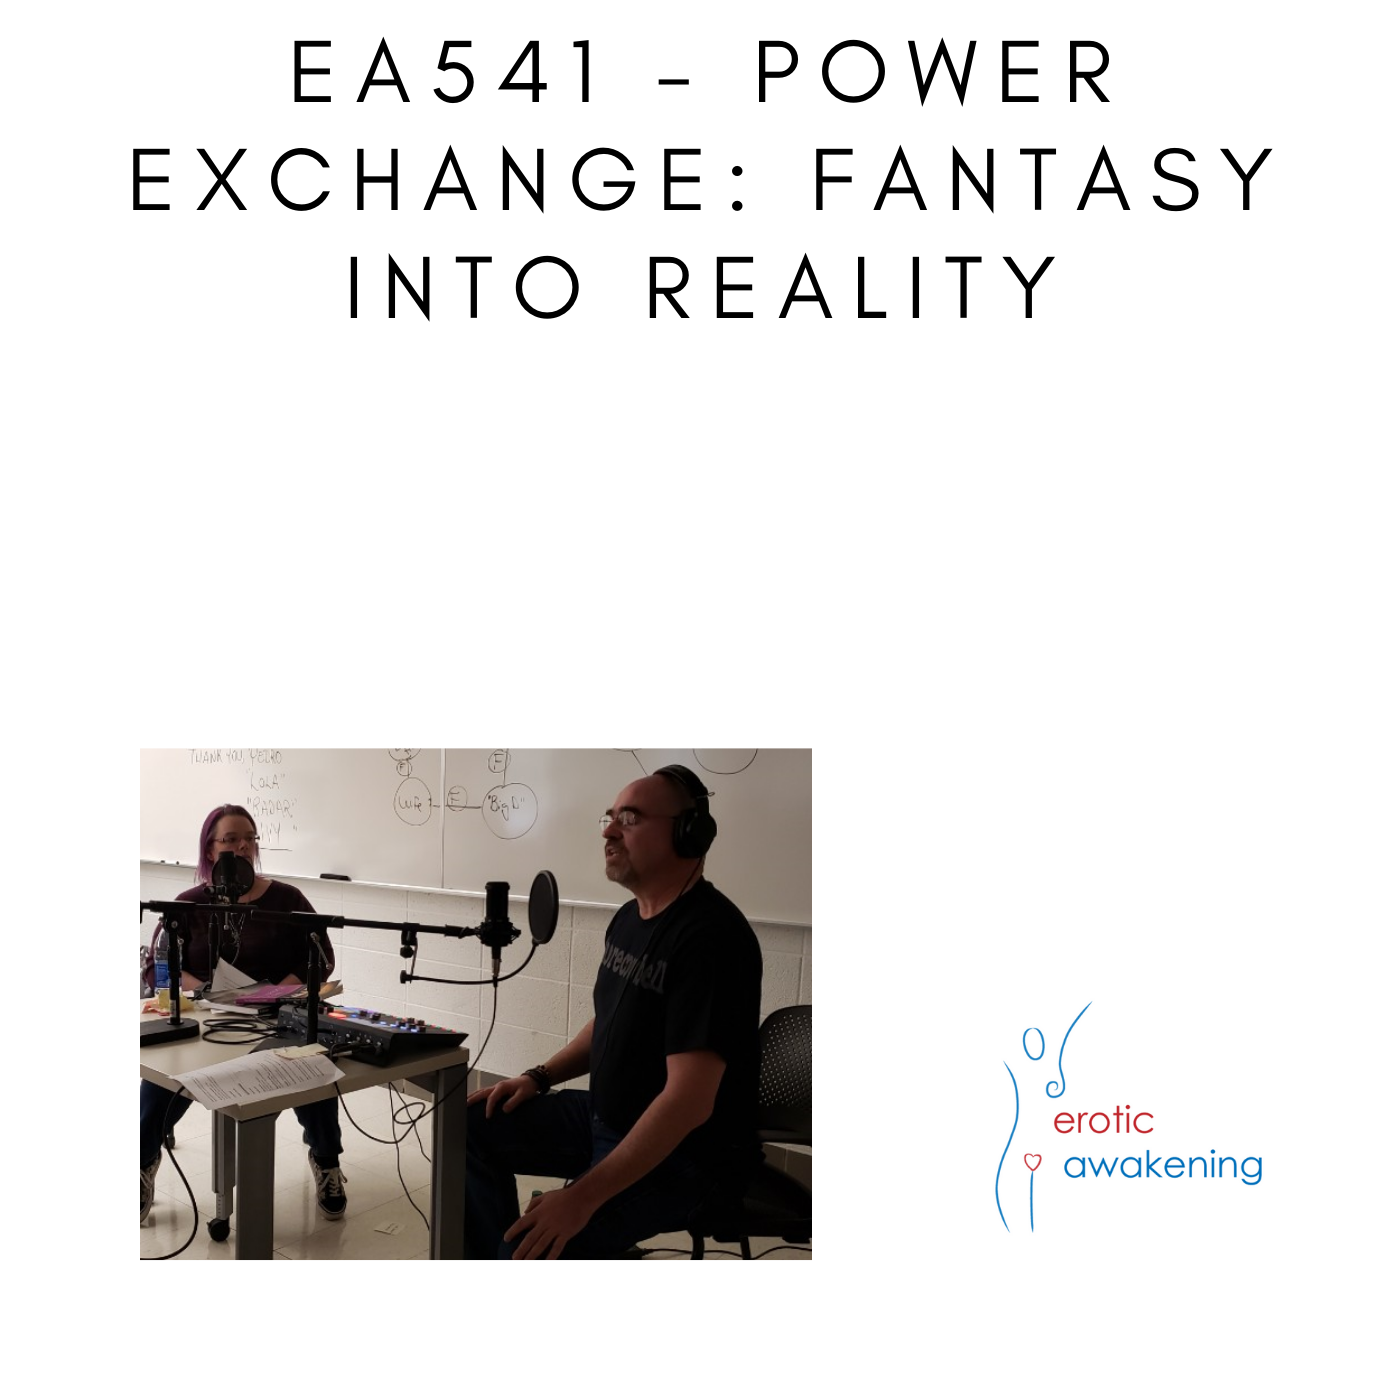 Erotic Awakening Podcast - EA541 - Power Exchange Fantasy Into Reality